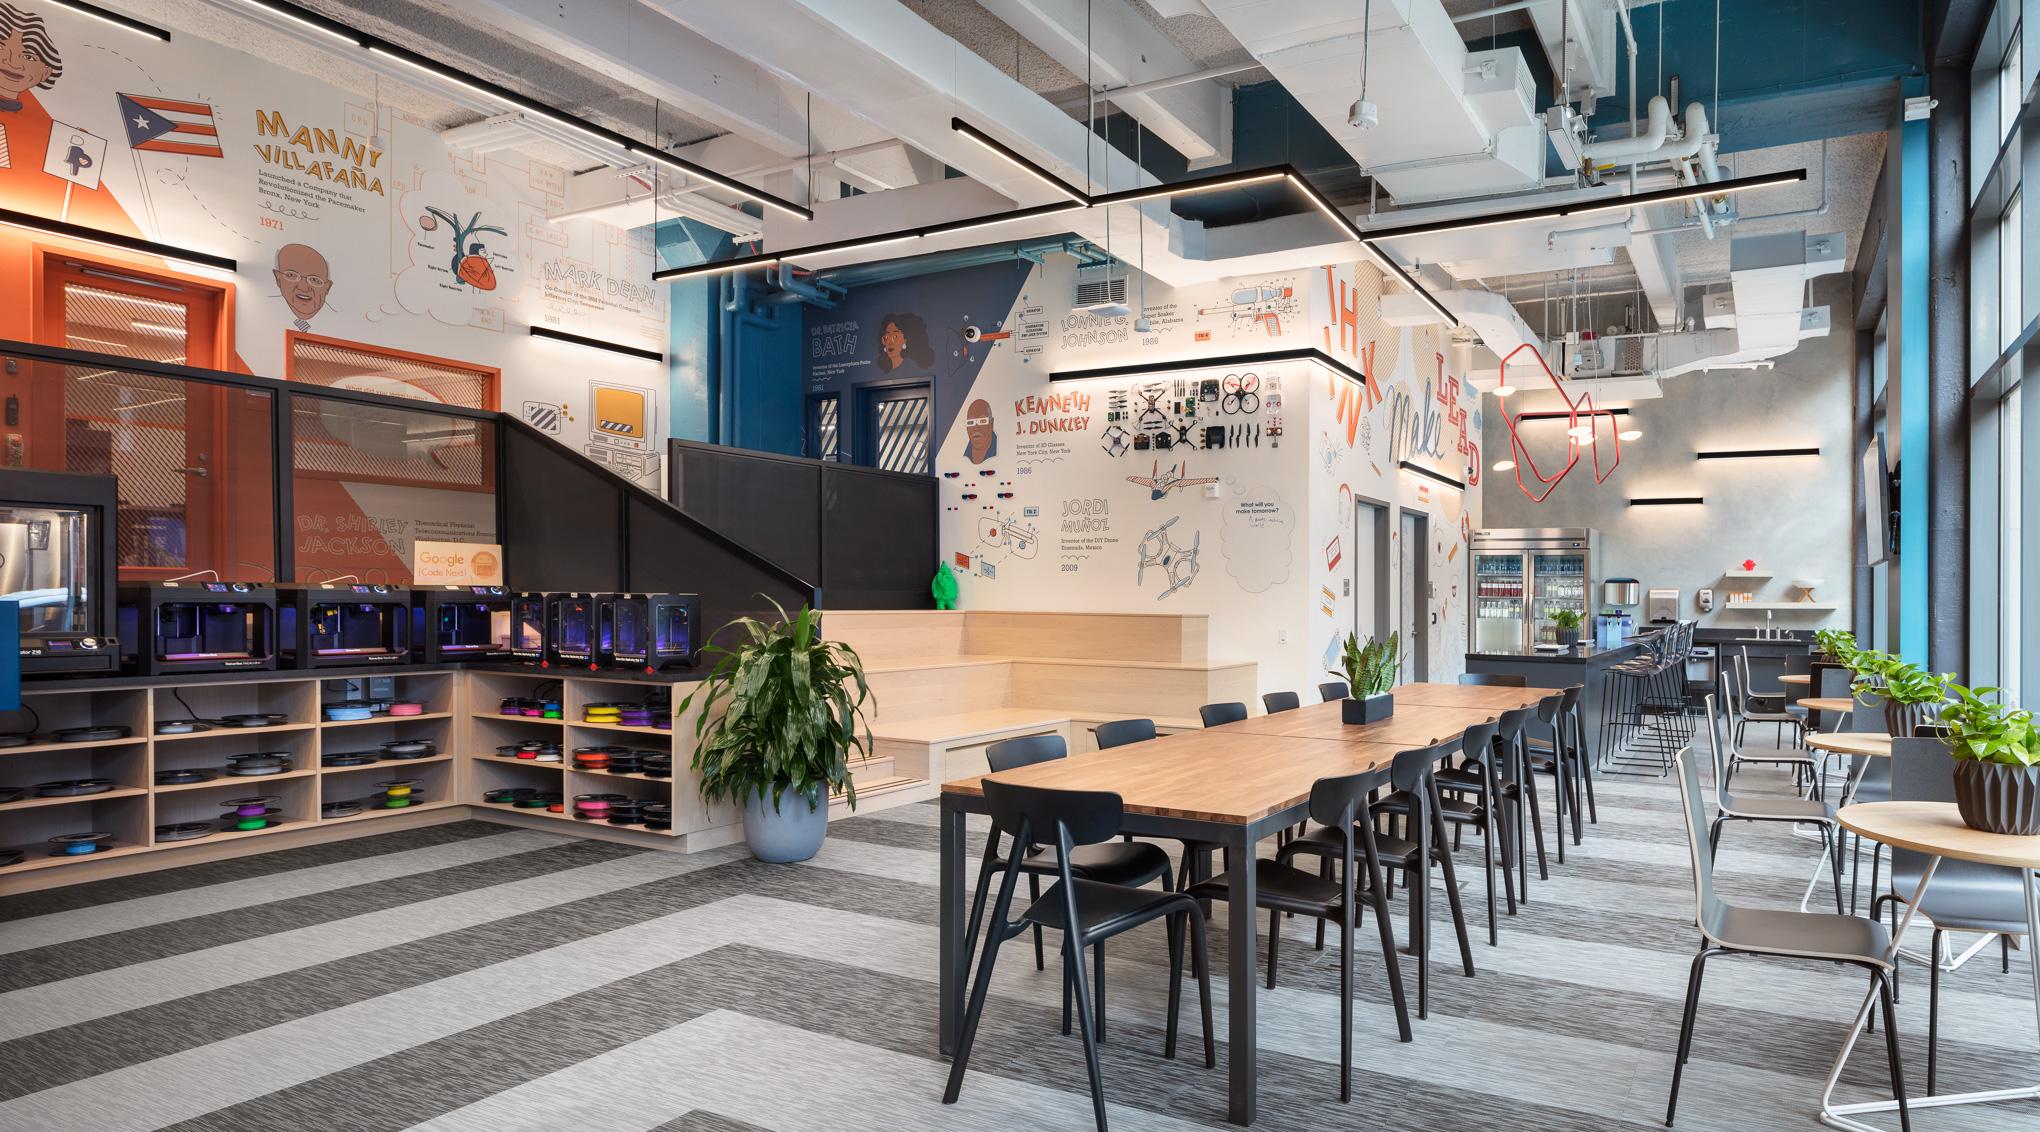 Google Code Next Lab - Computer Science Education Lab, New York City